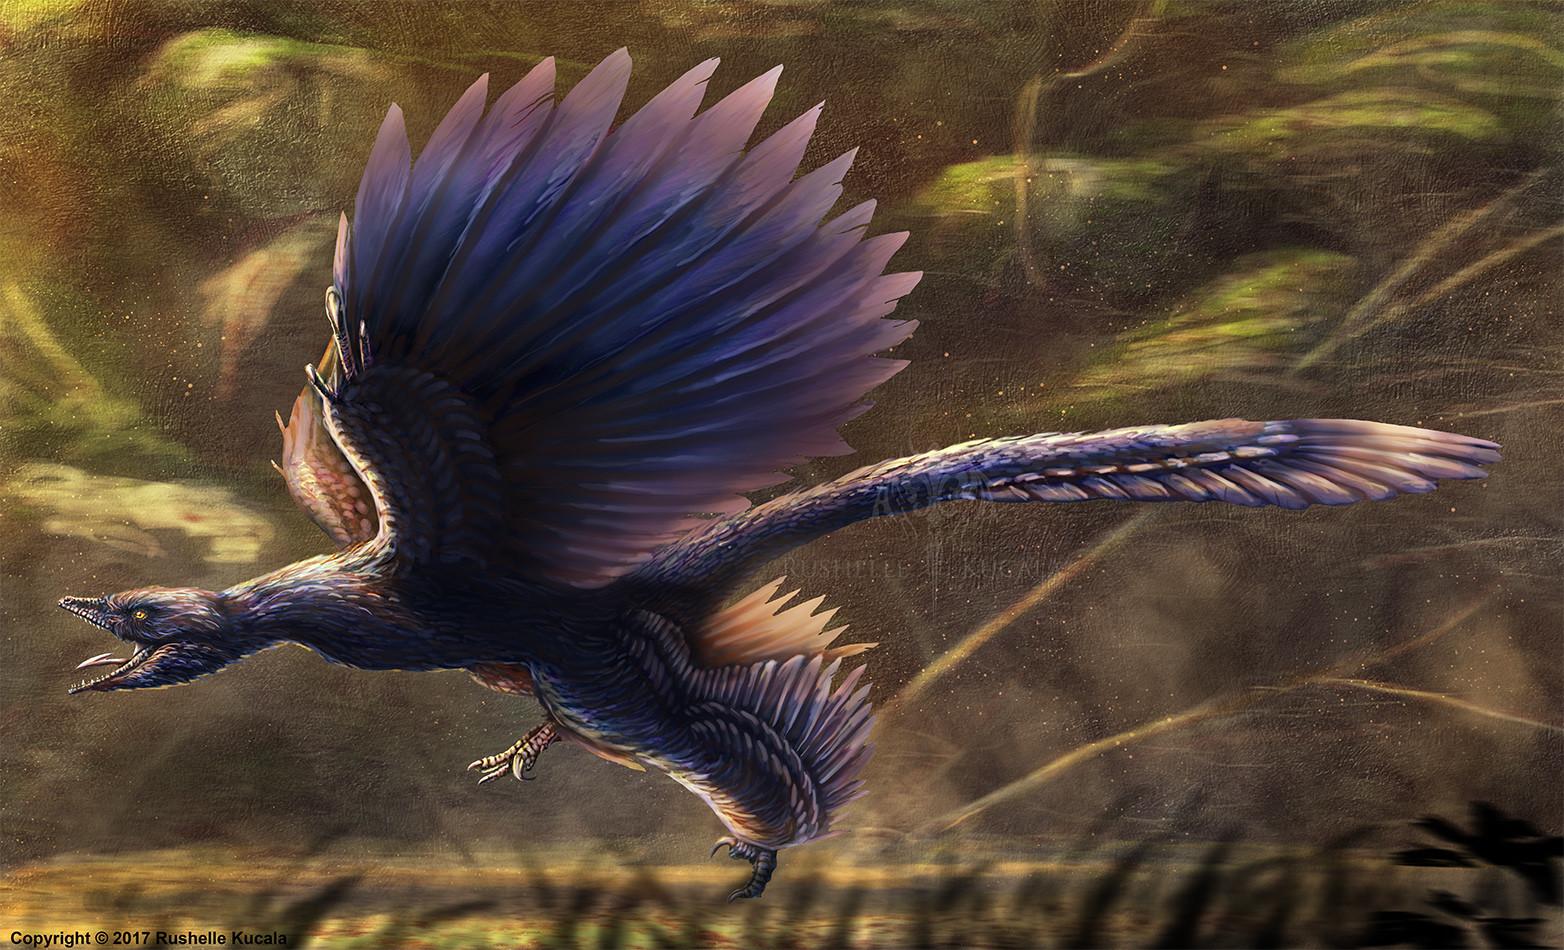 rushelle-kucala-microraptorguirestored